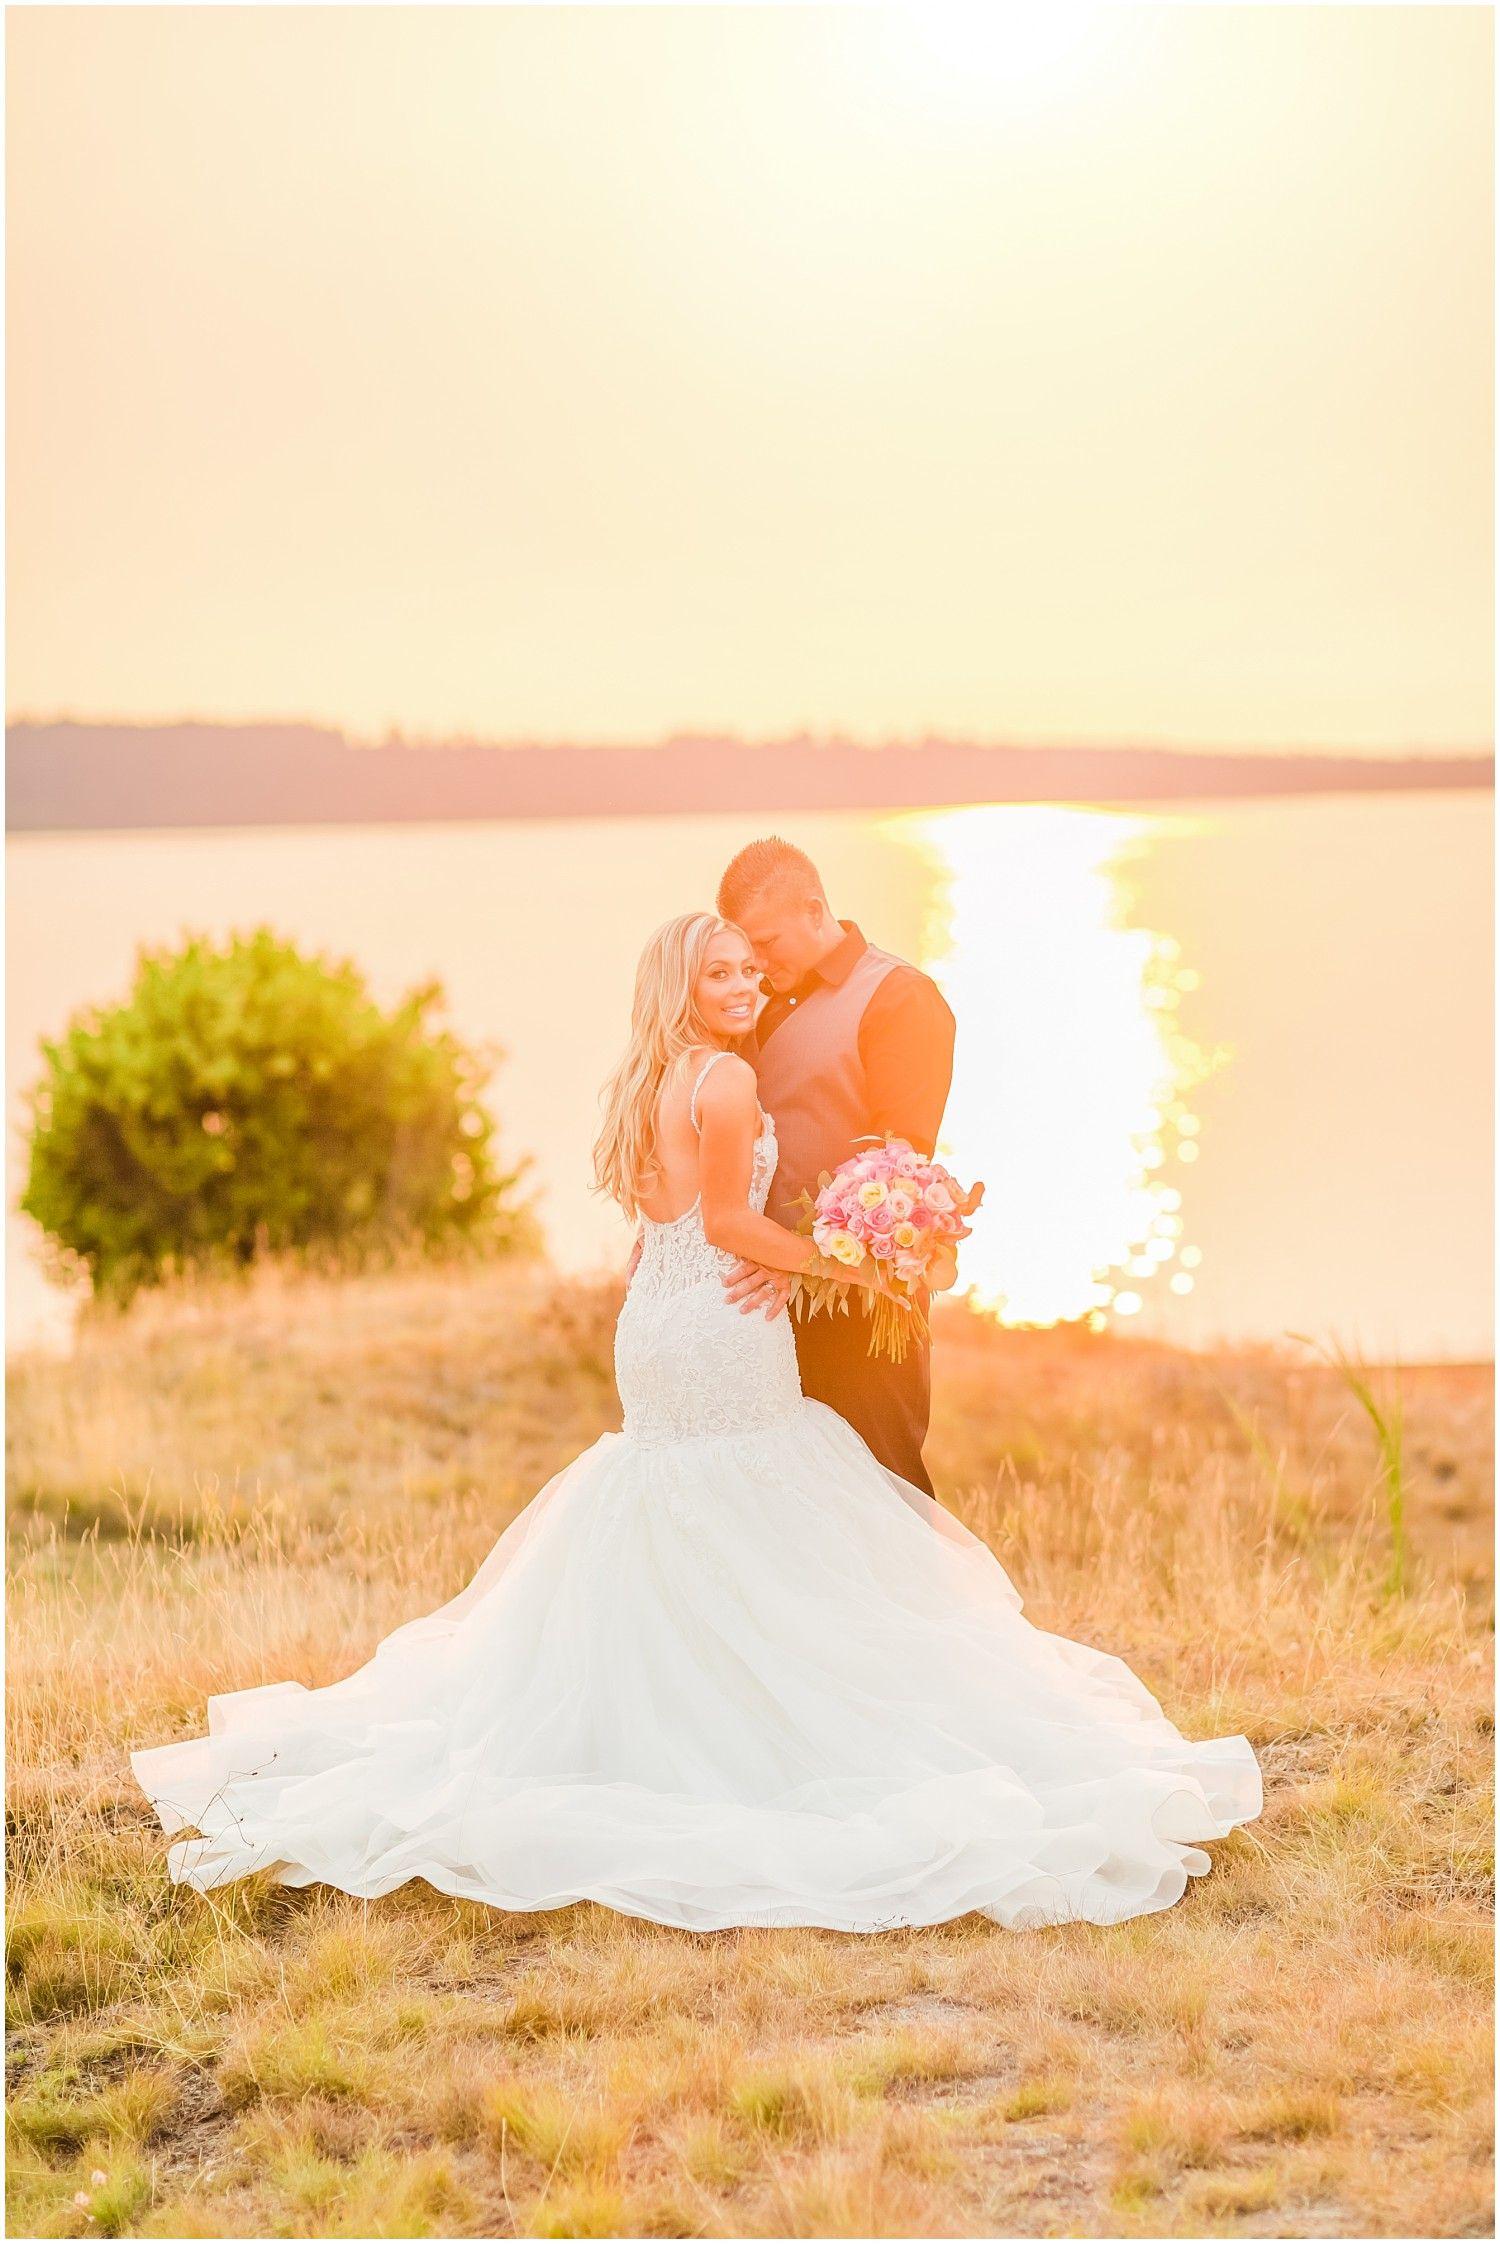 Chambers Bay Intimate Wedding Ulysses Danielle Sunset Wedding Photos Sunset Wedding Intimate Wedding